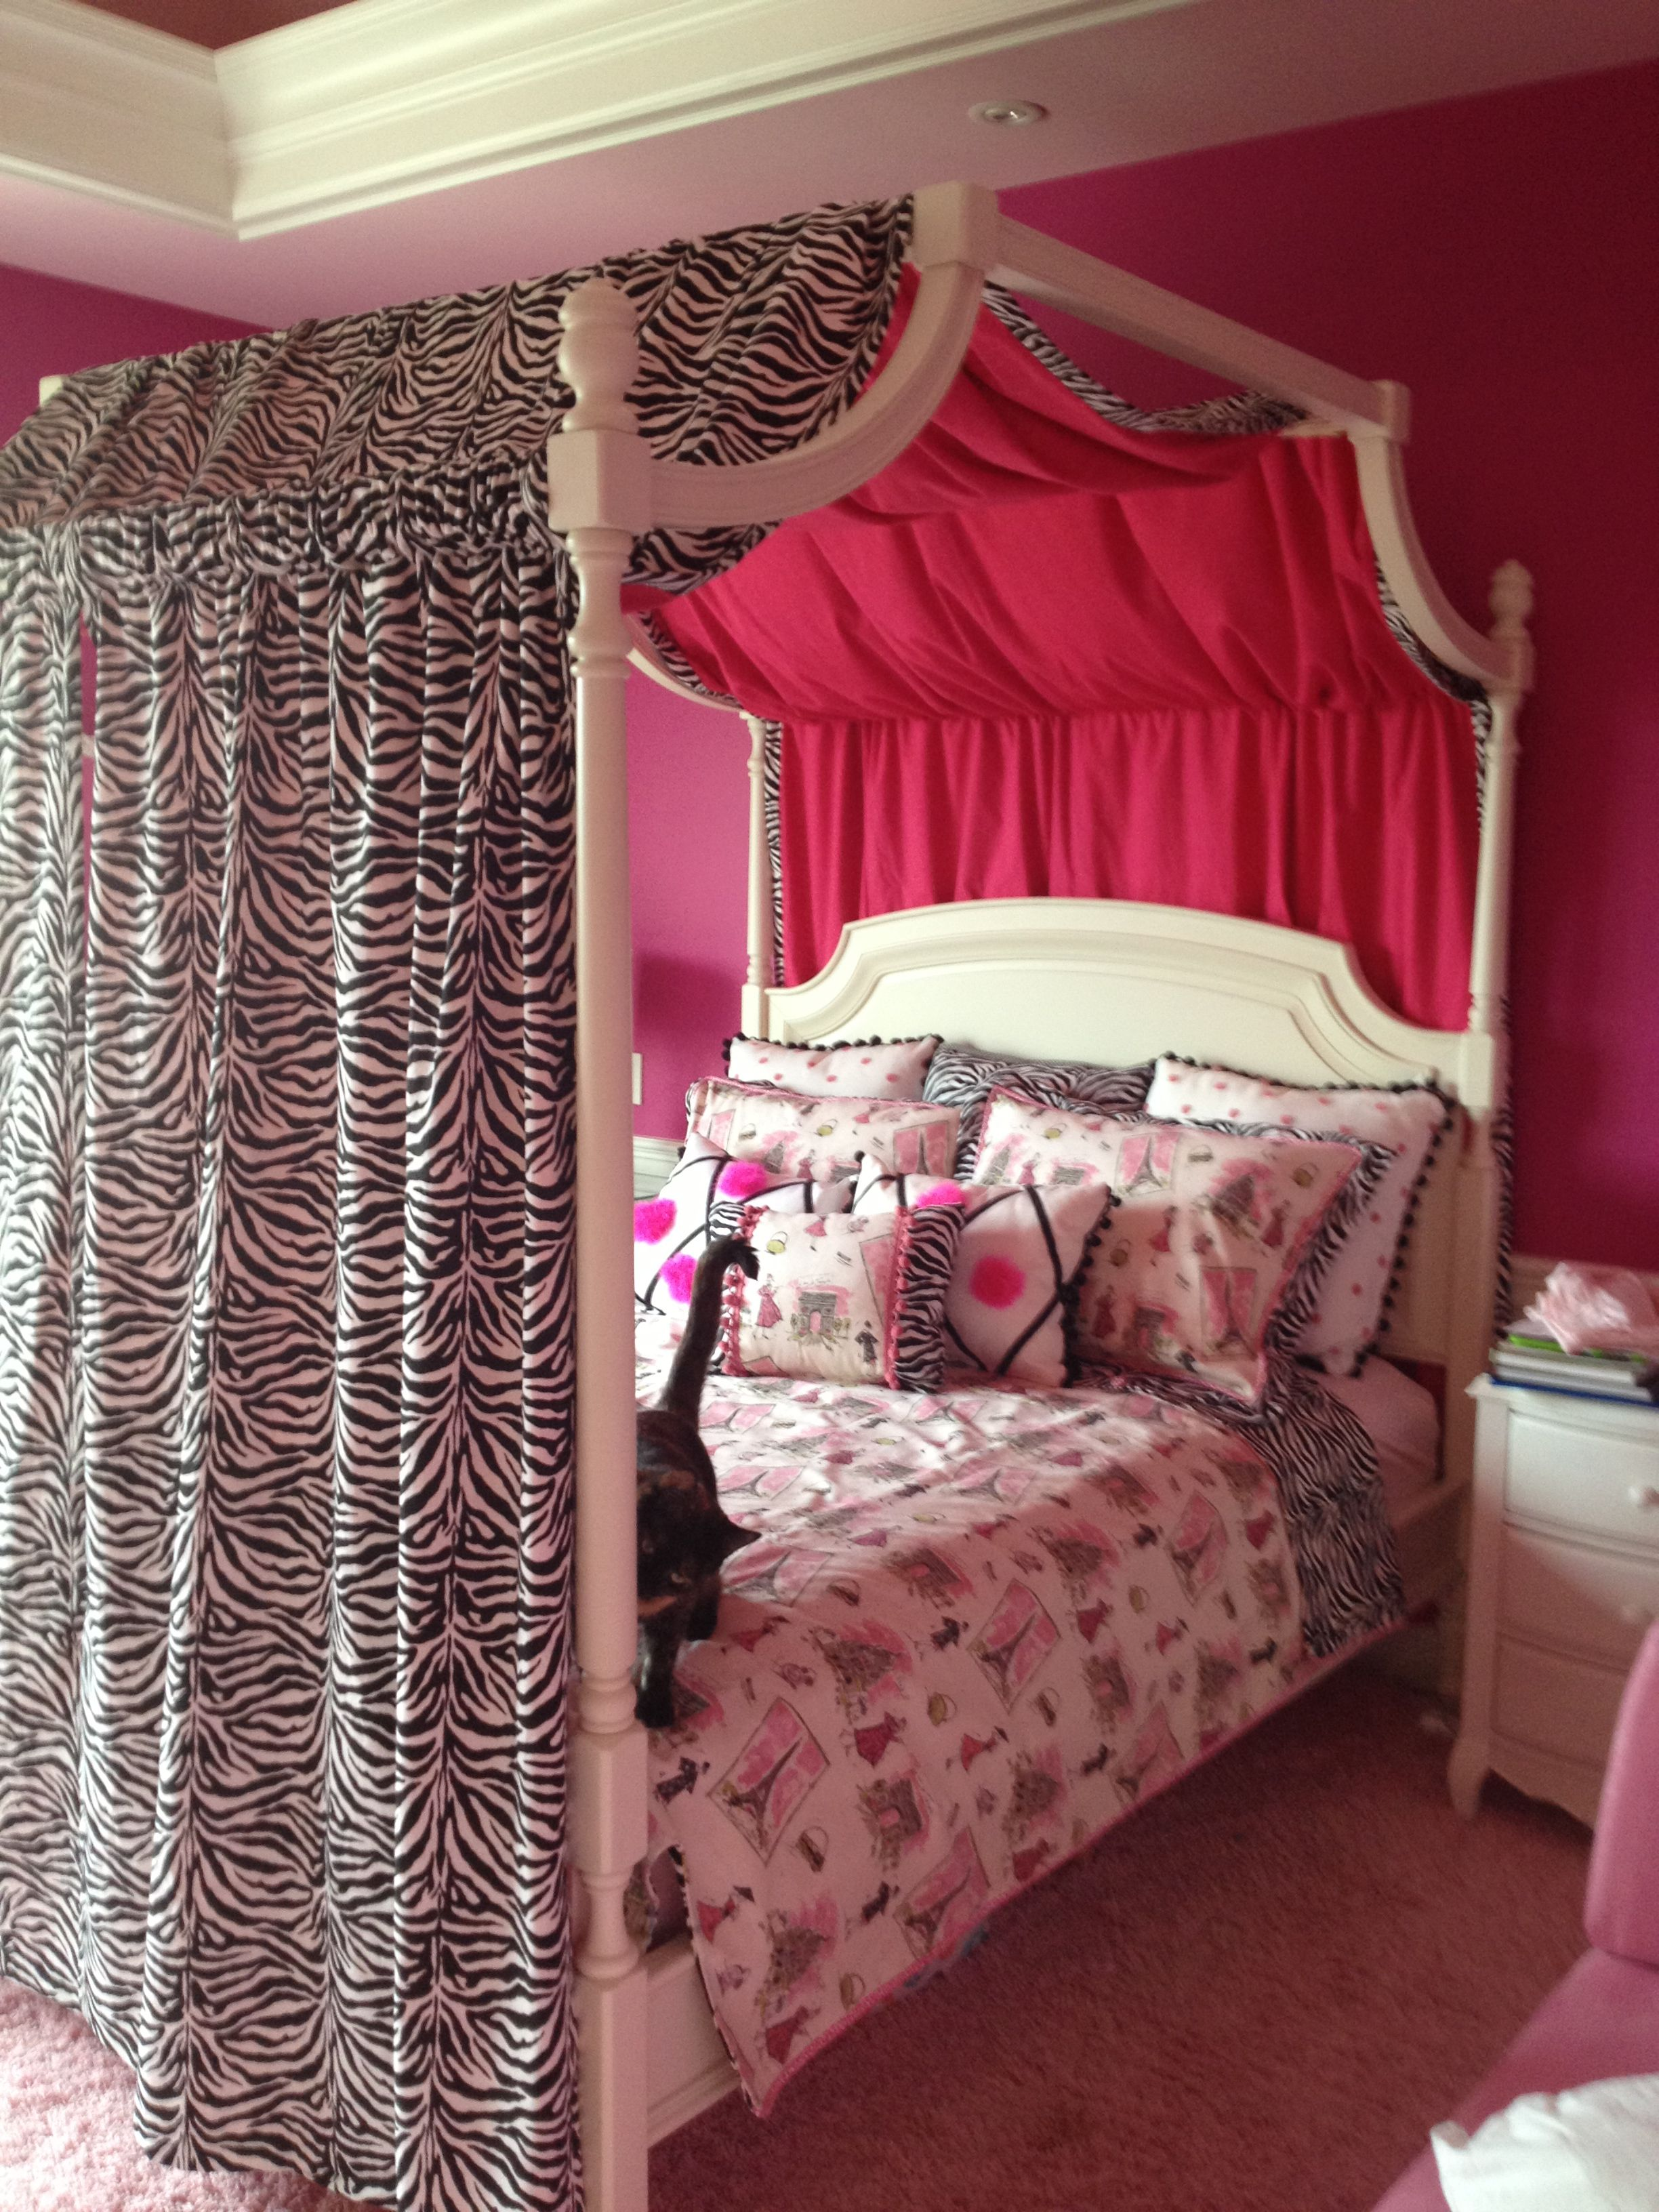 Zebra Bedroom For Girls Bedrooms Pinterest